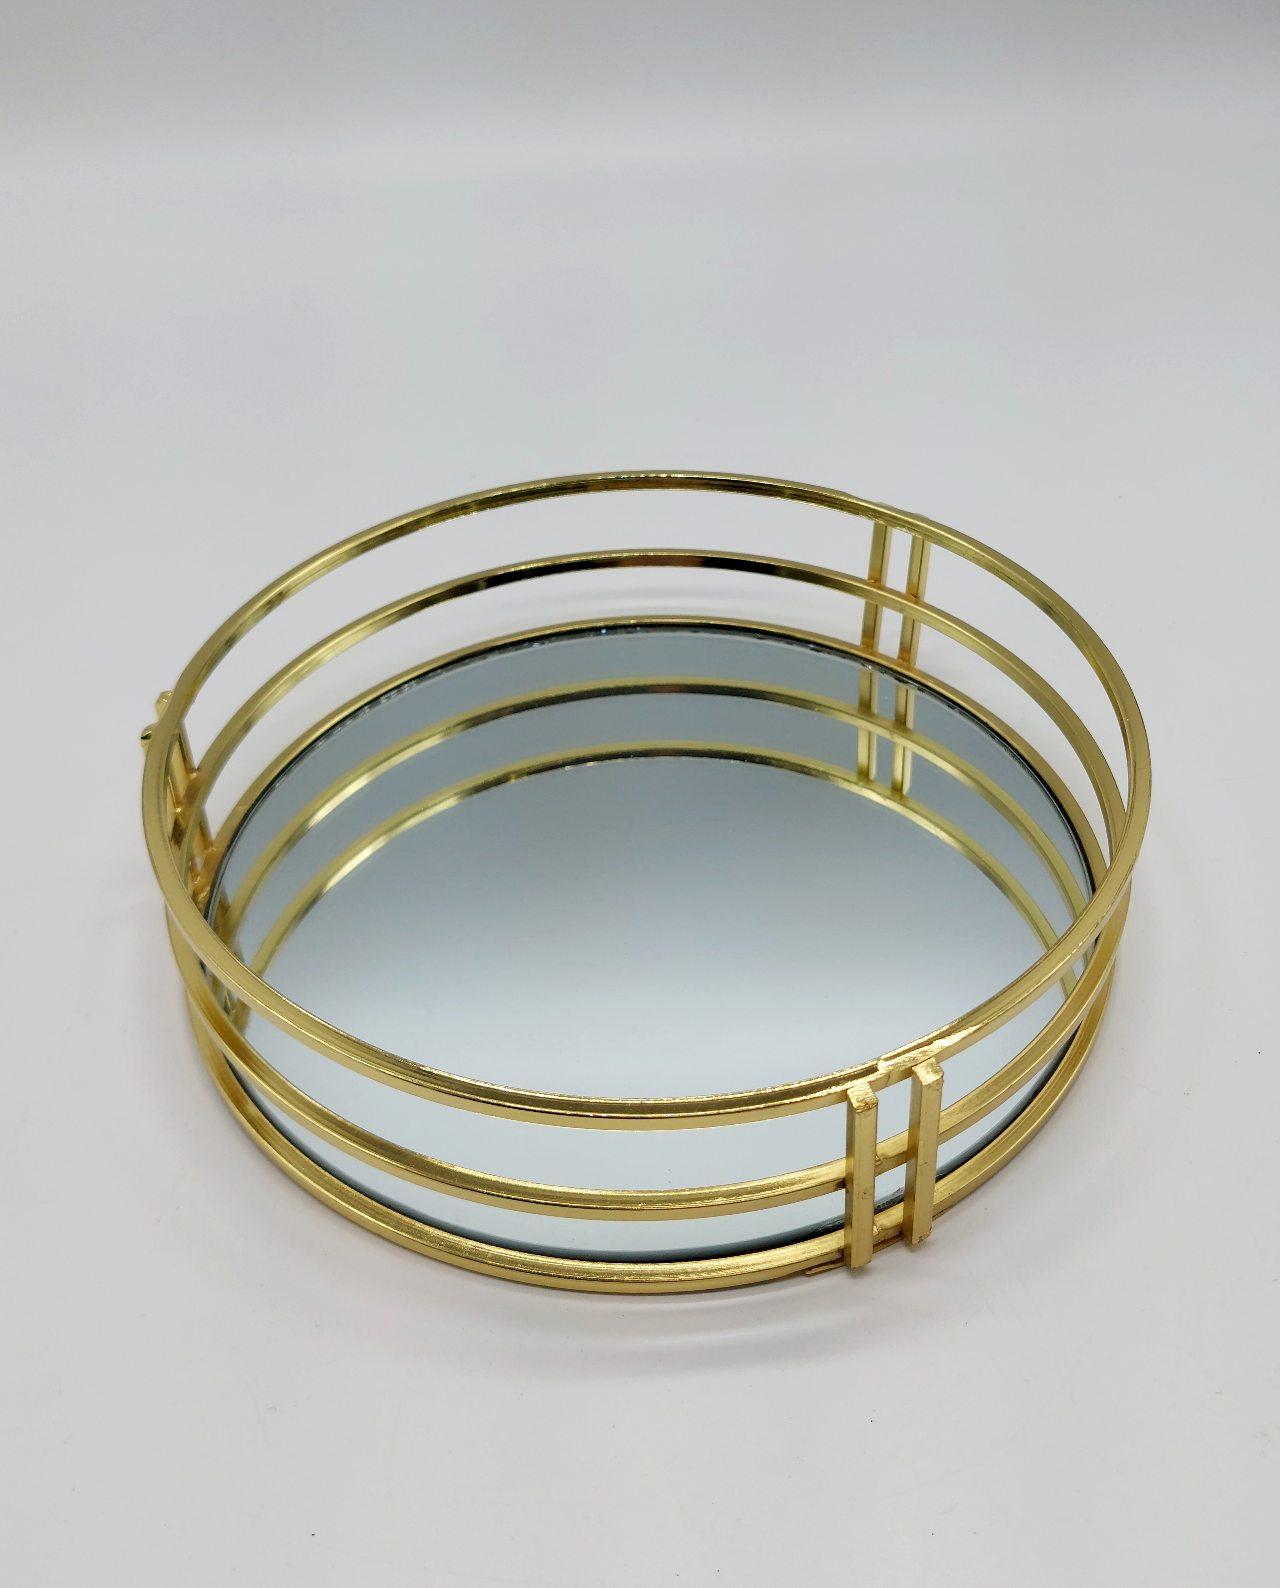 Tray Round Metal Gold Mirror Diameter 20 cm